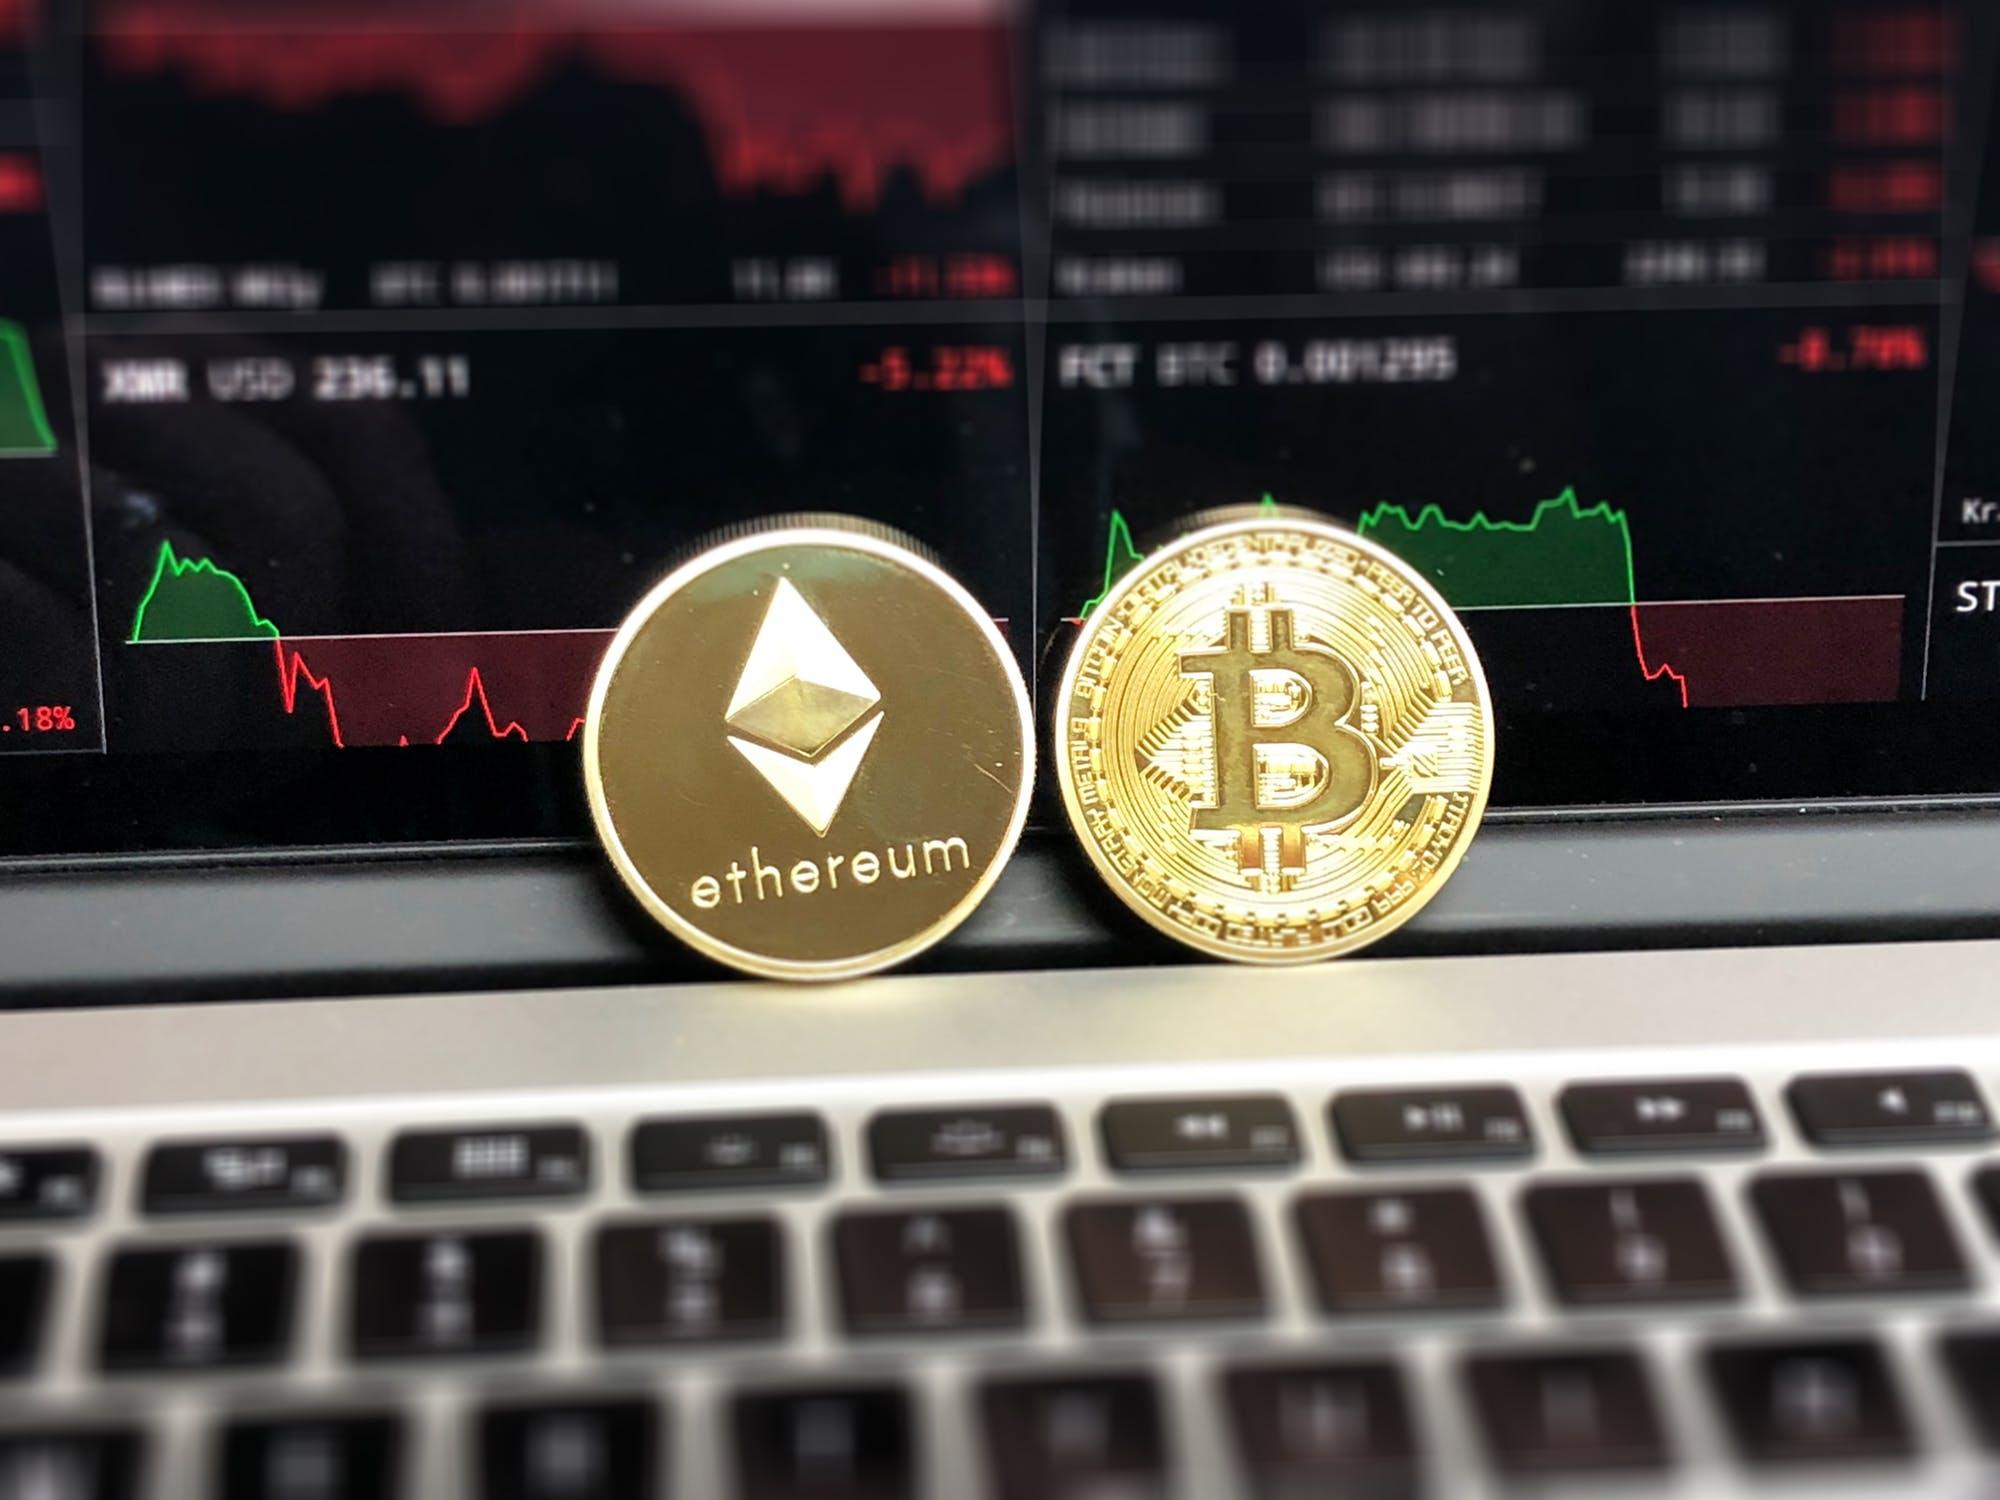 investimento de mistura de bitcoin